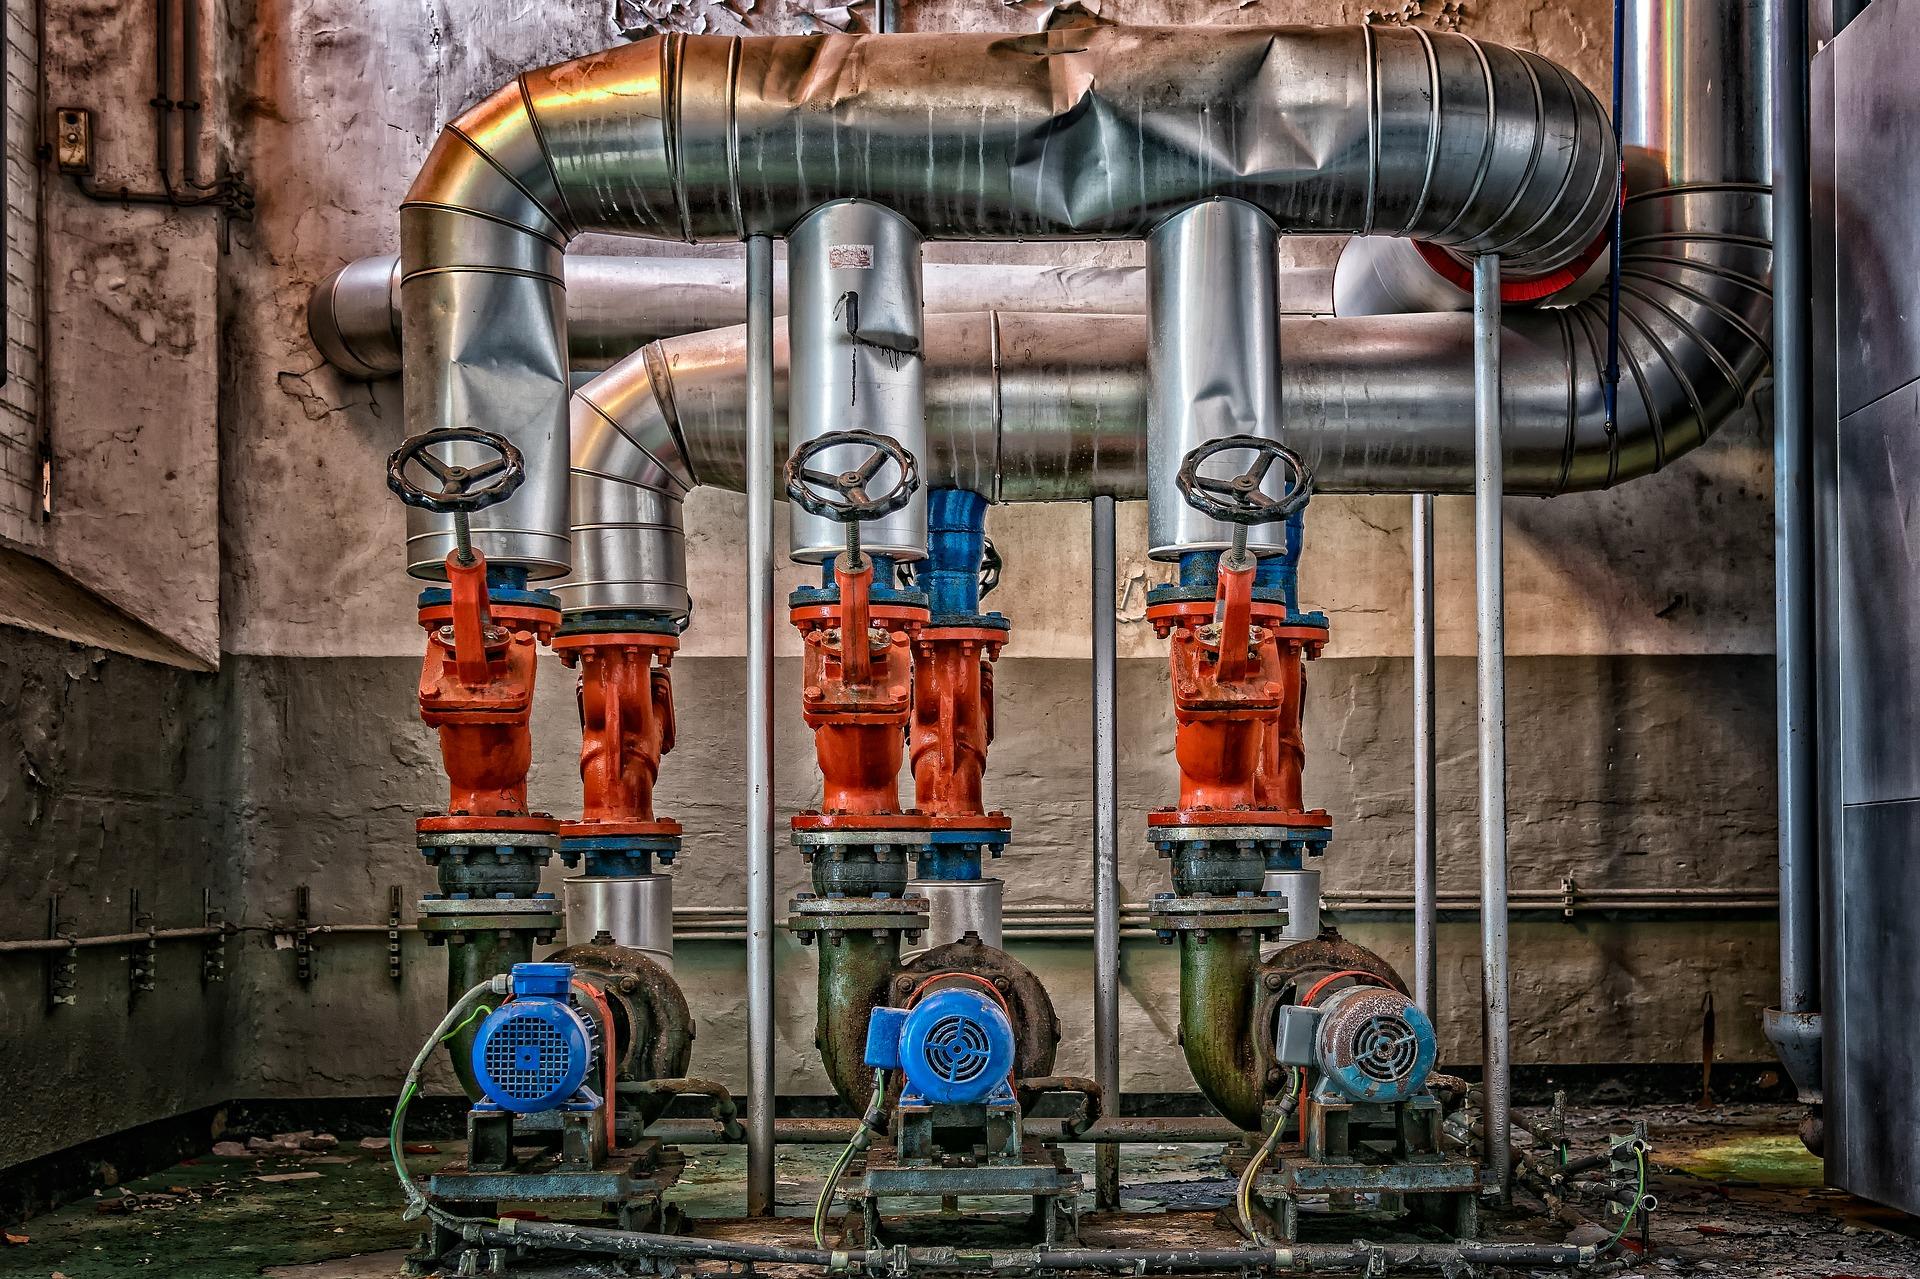 heating-3212503_1920